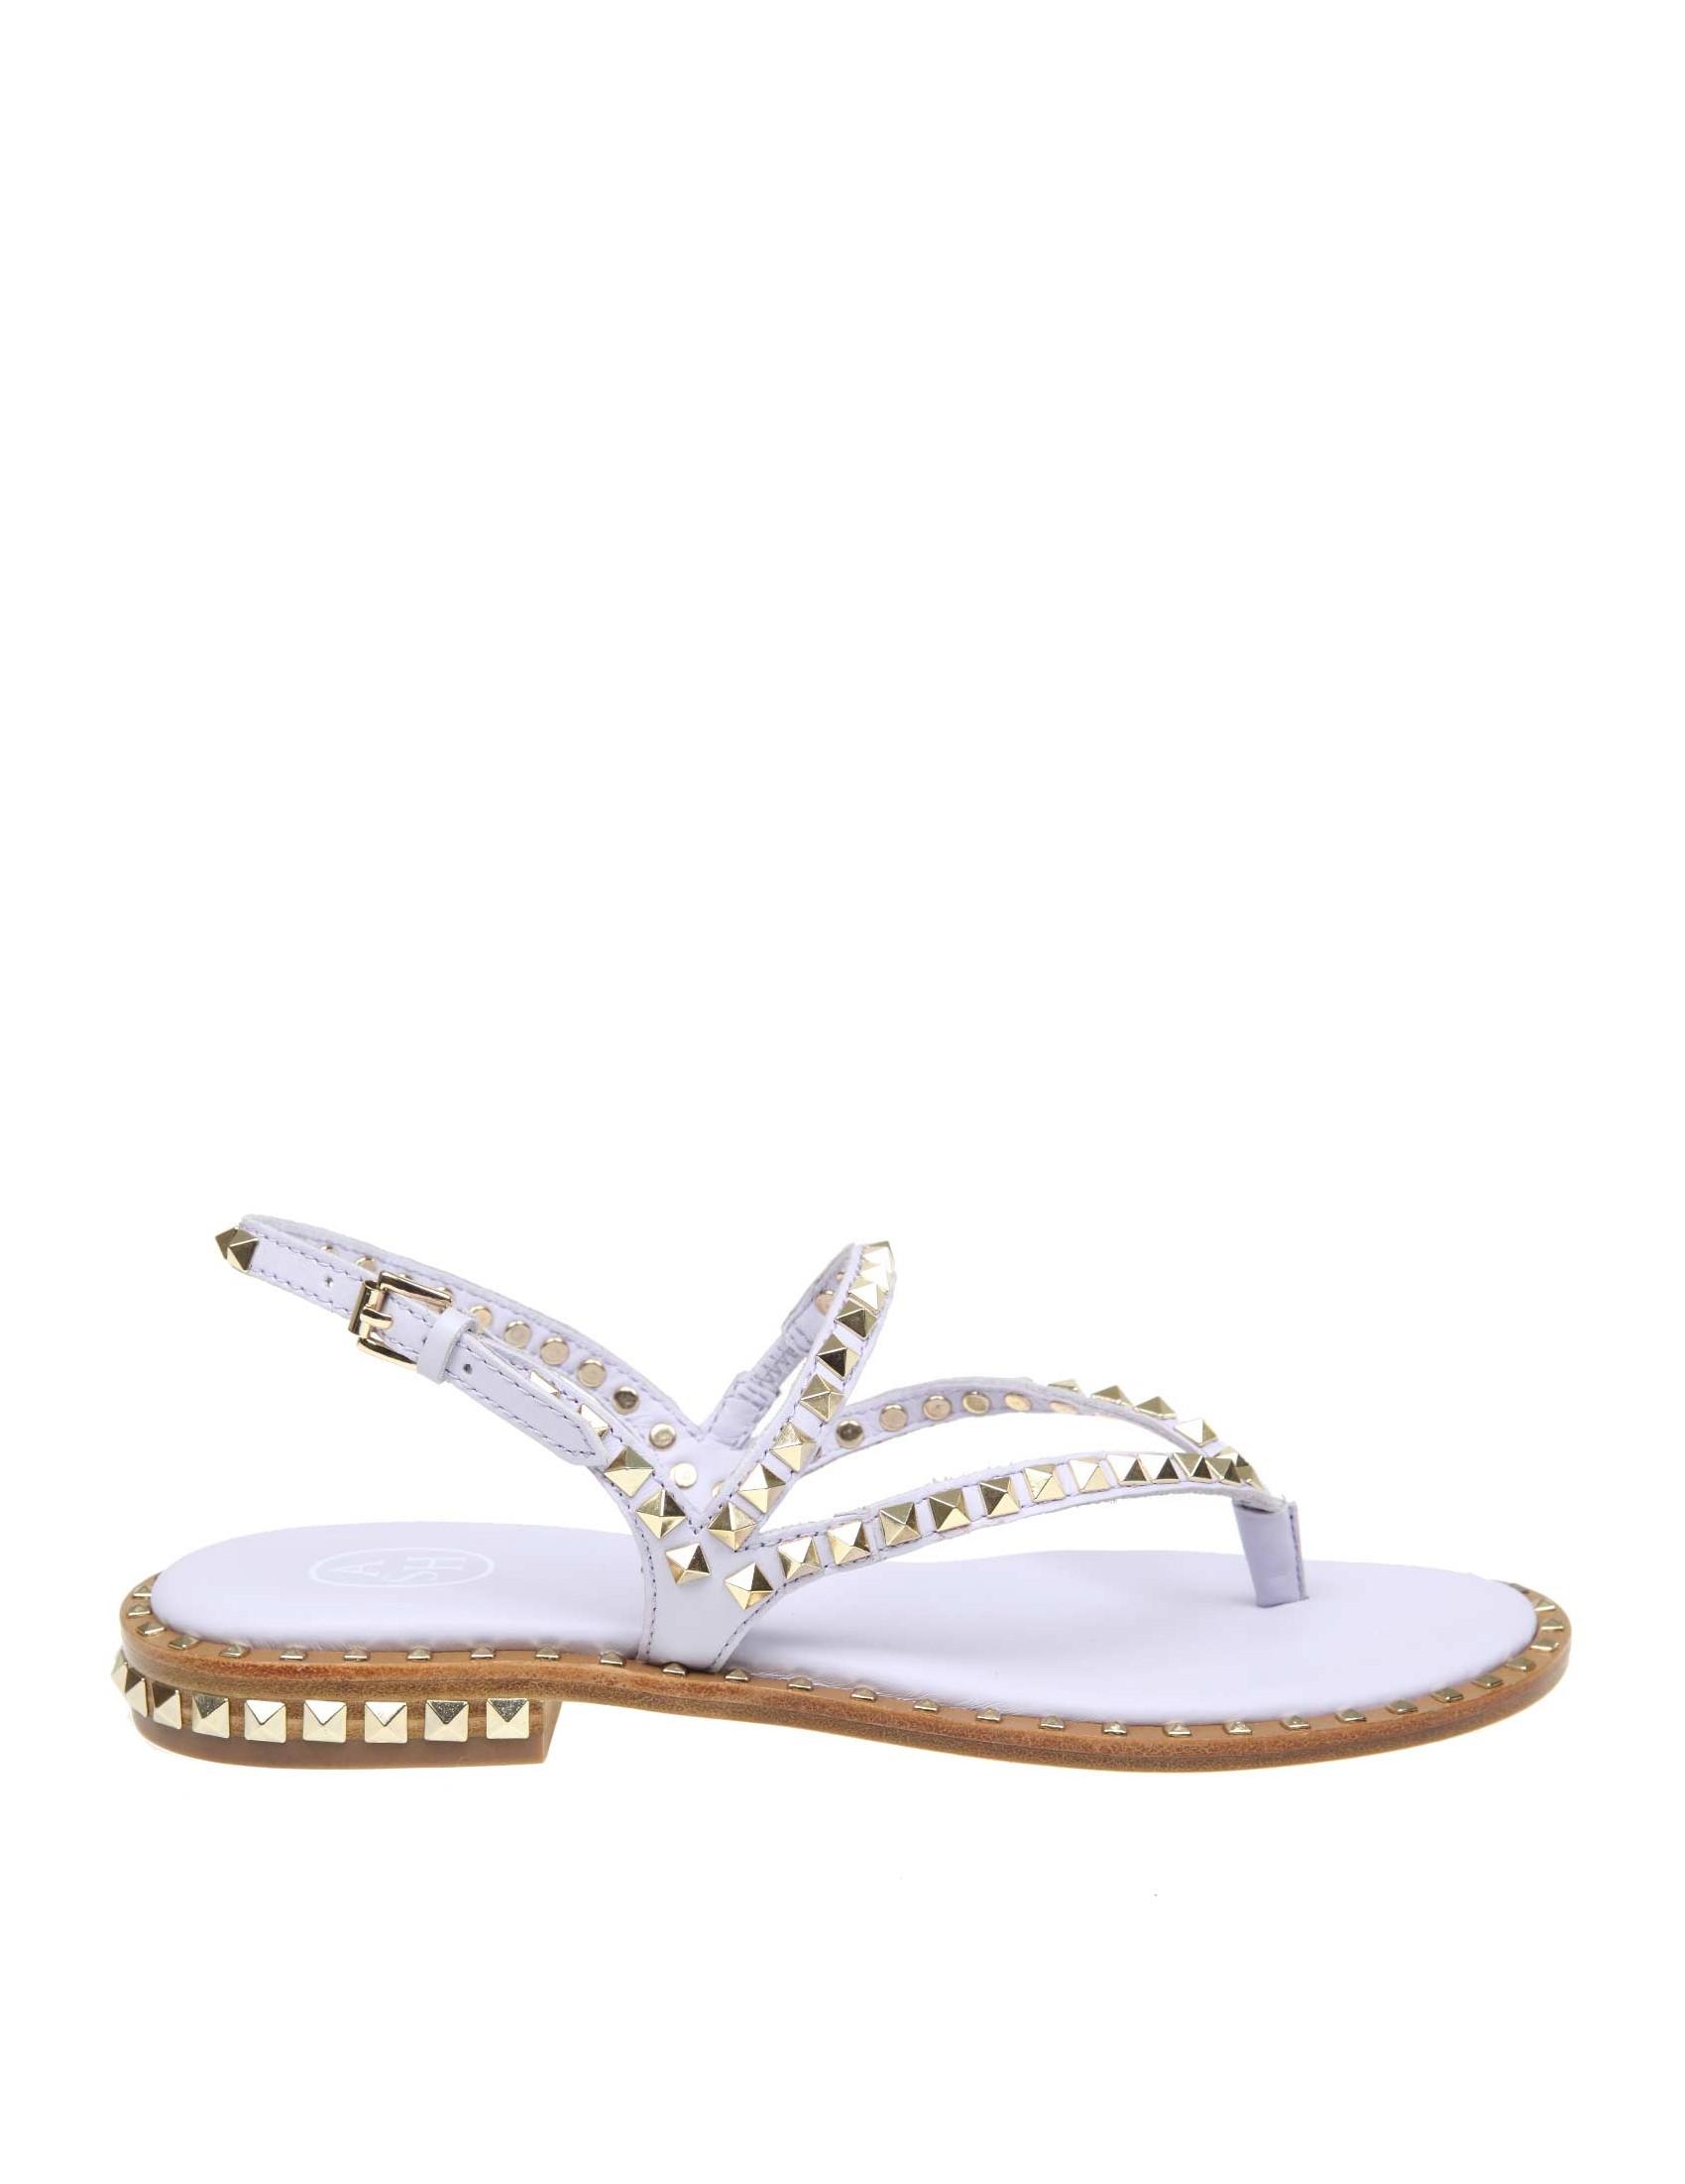 Sandalo Peps Ash In Leather Color Lavender zVpSMGqU